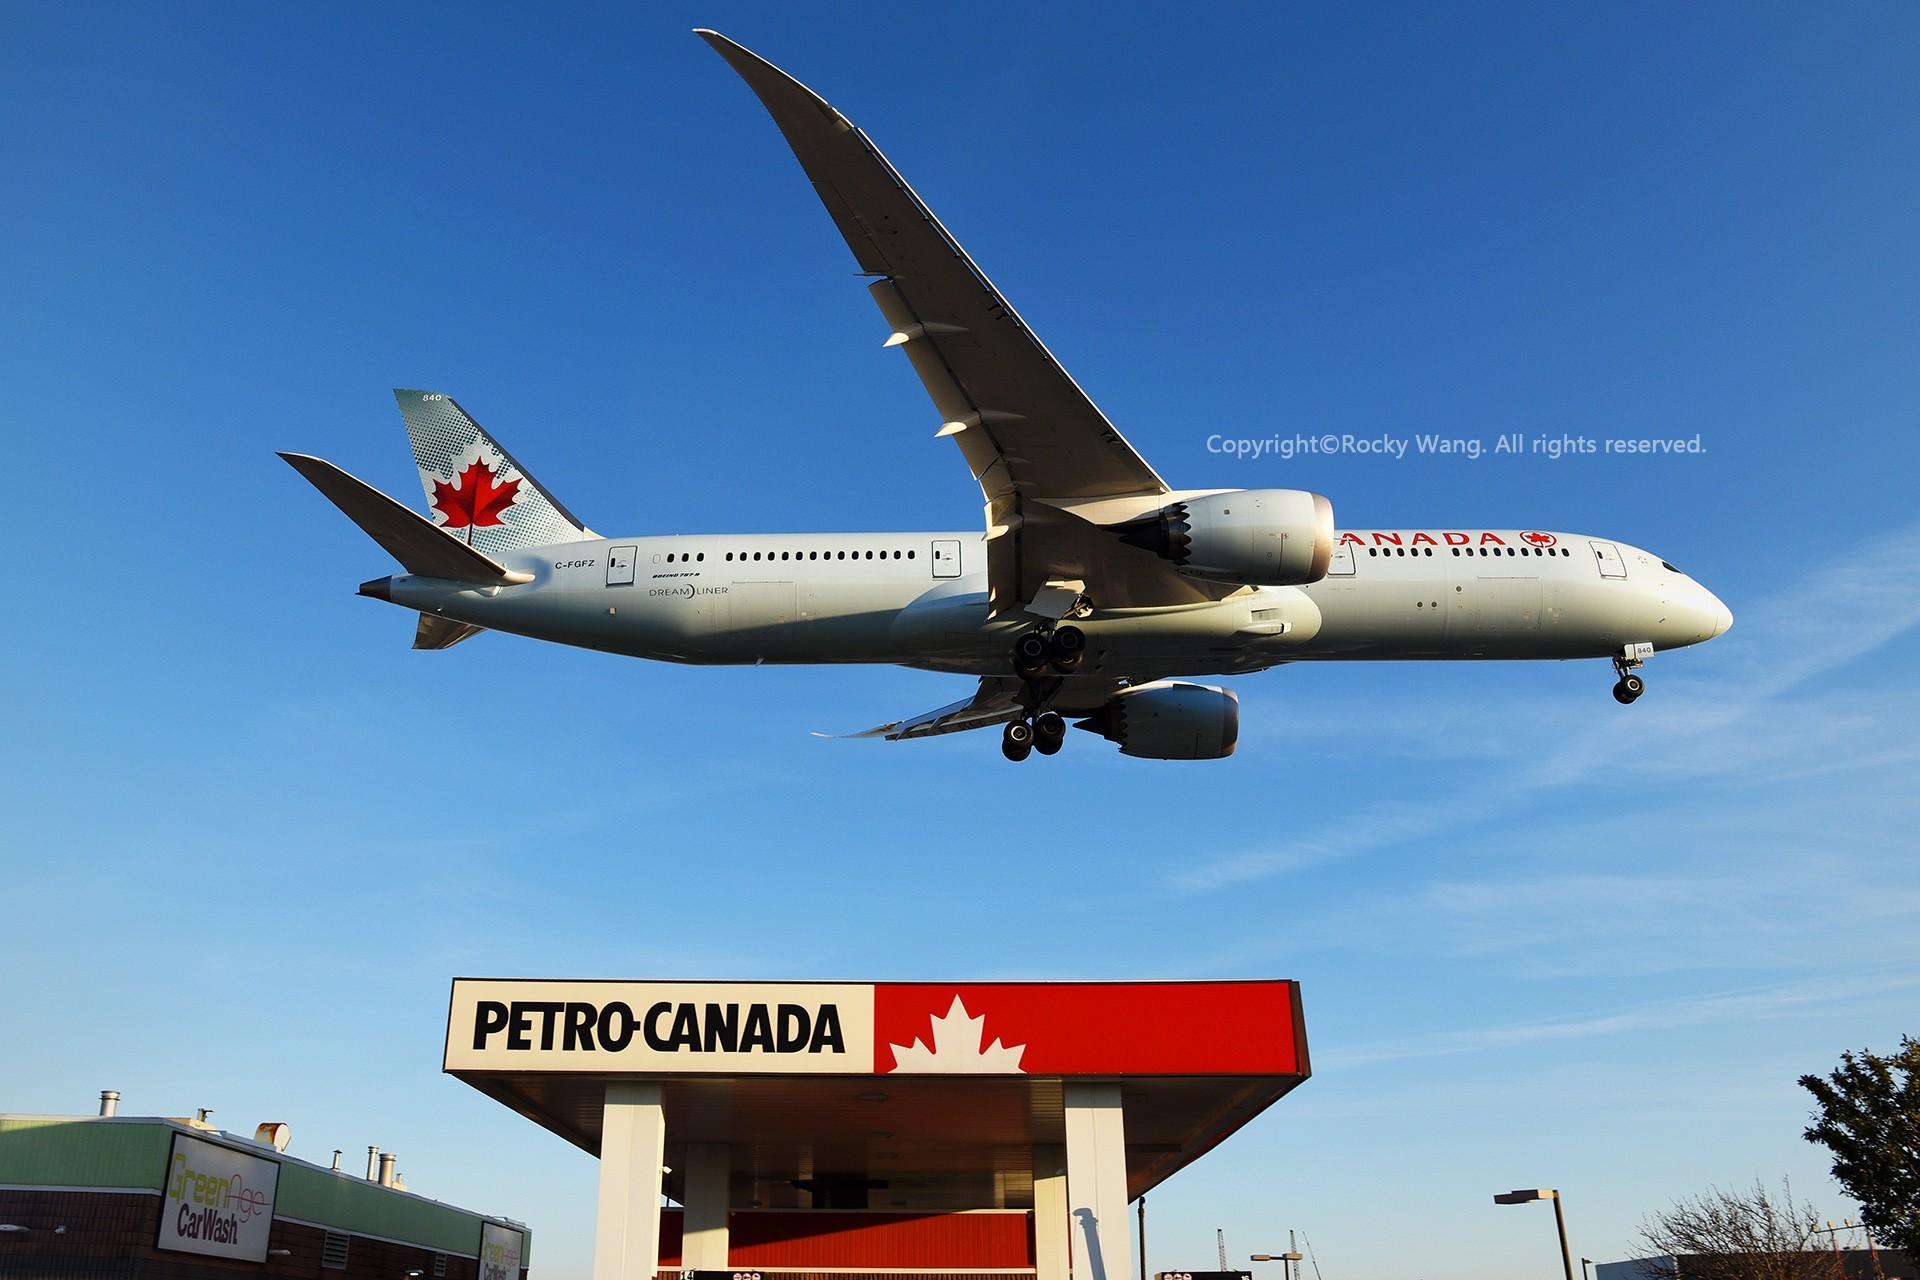 Re:[原创]CYYZ 30图 BOEING 787-9 DREAMLINER C-FGFZ Toronto Lester B. Pearson Int'l Airport